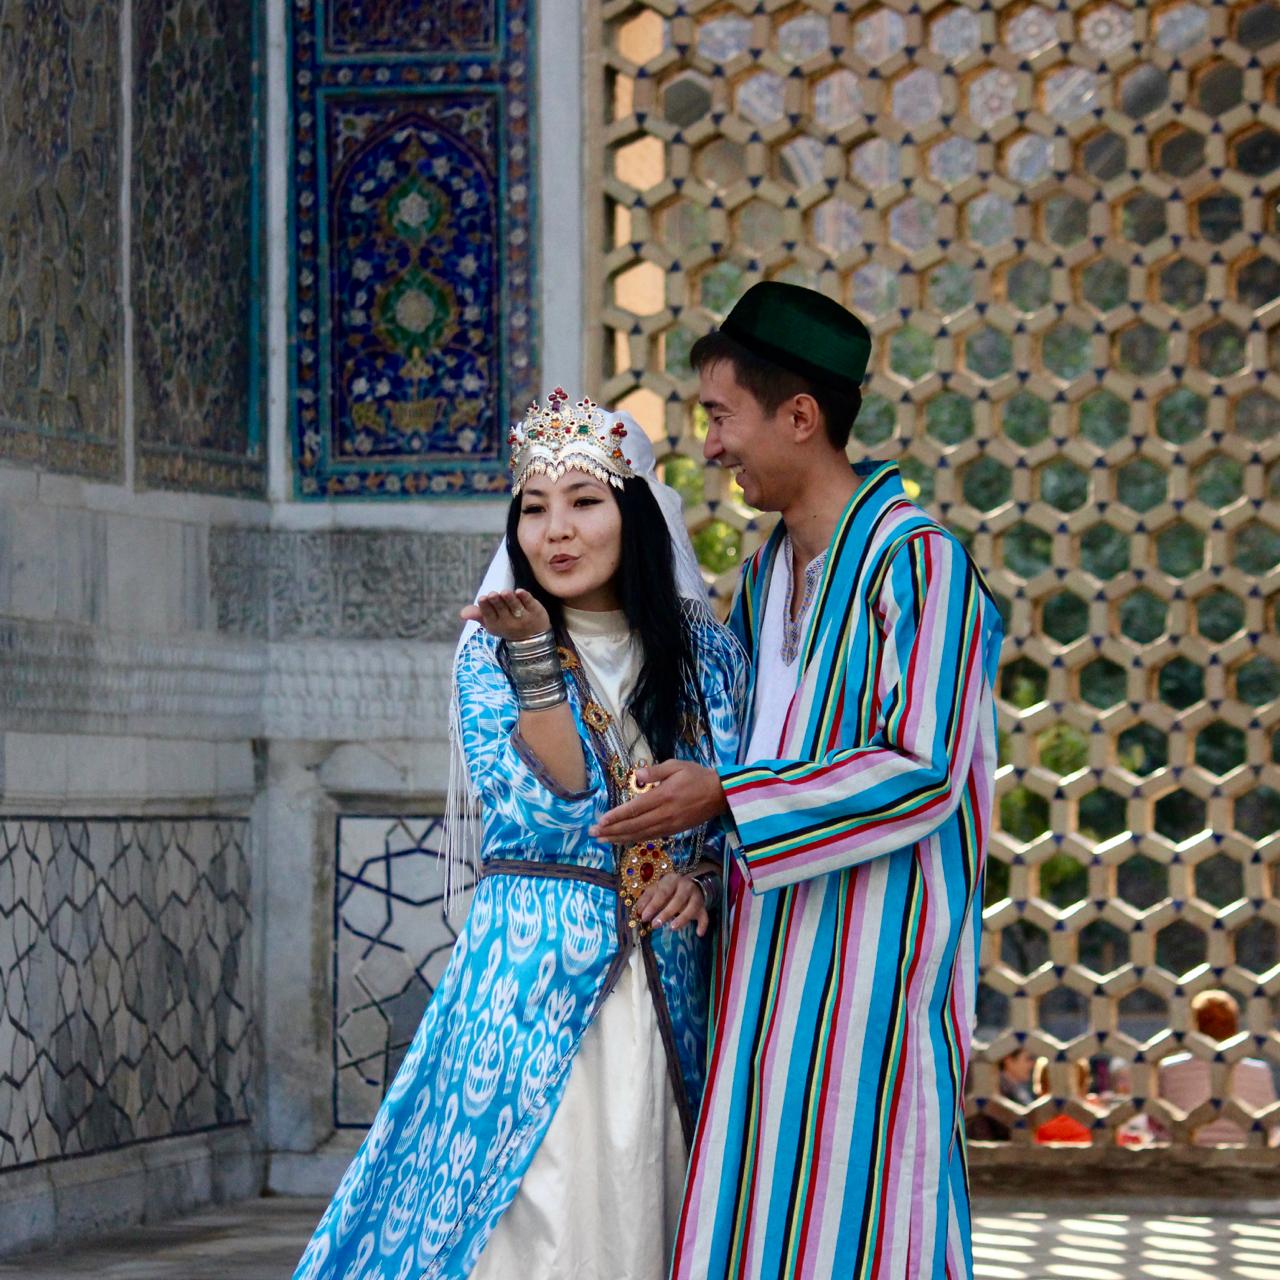 samarkand, uzbekistan - 20